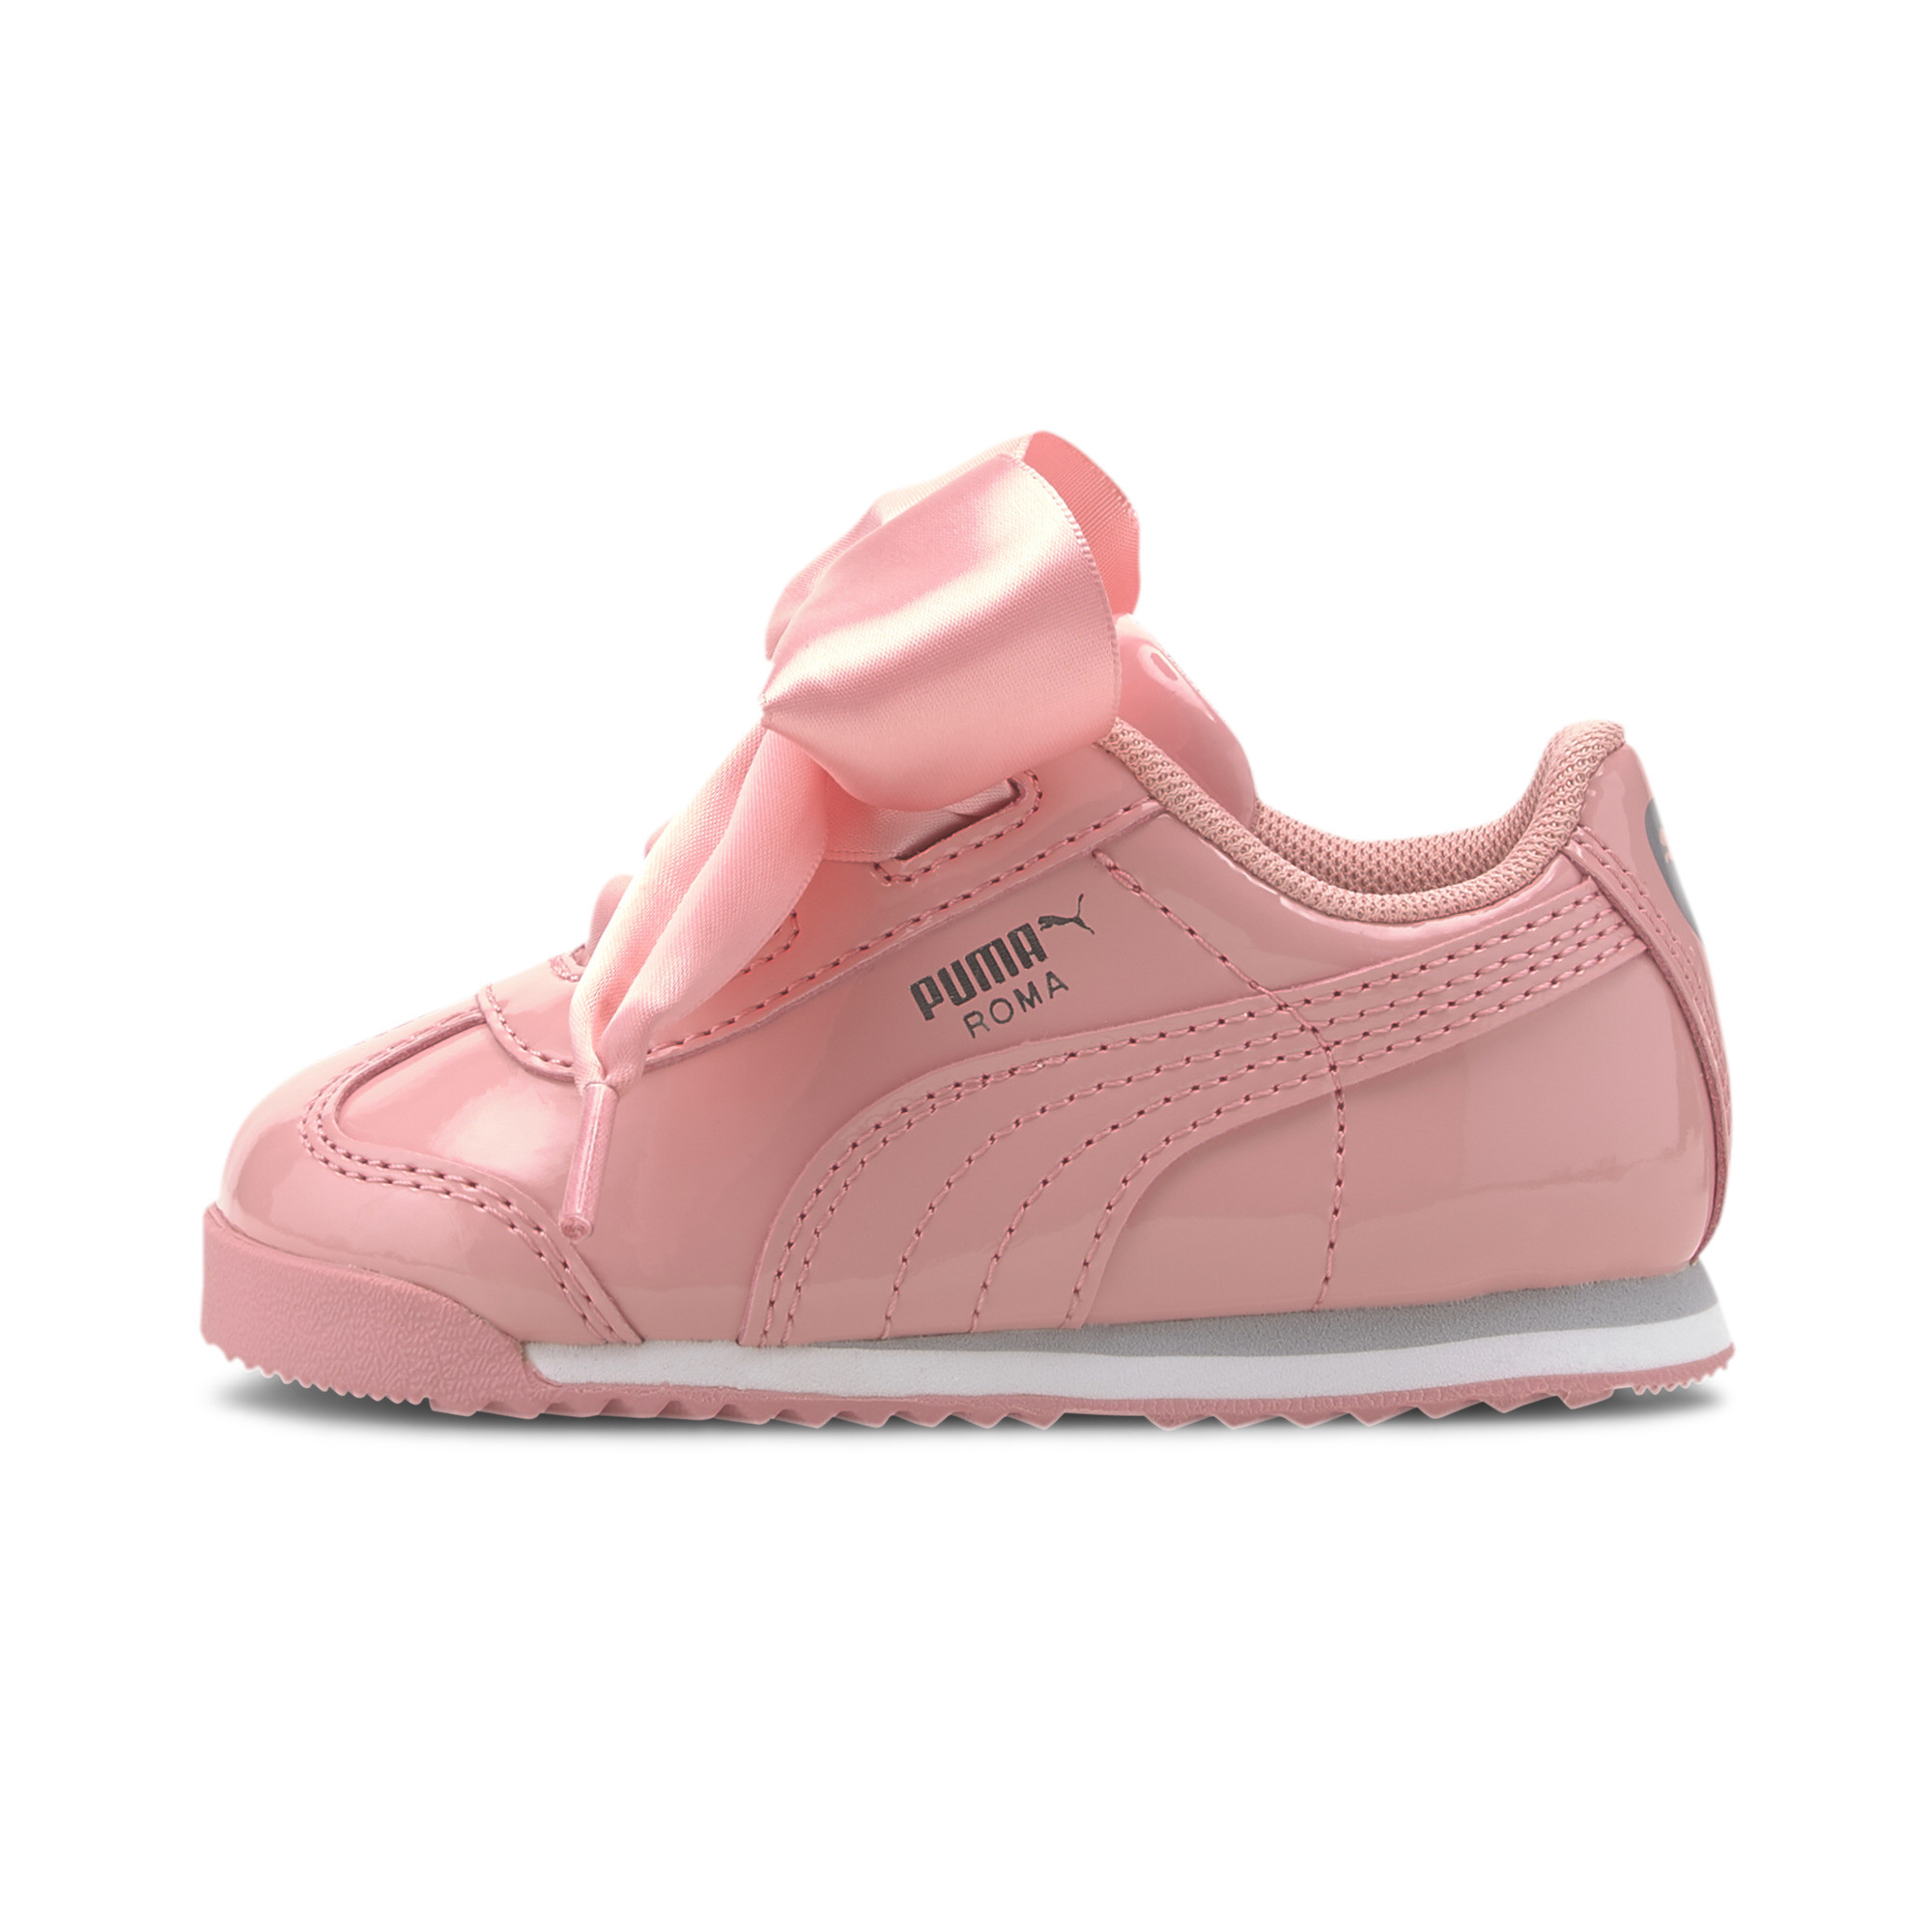 PUMA-Roma-Heart-Patent-Toddler-Shoes-Girls-Shoe-Kids thumbnail 22